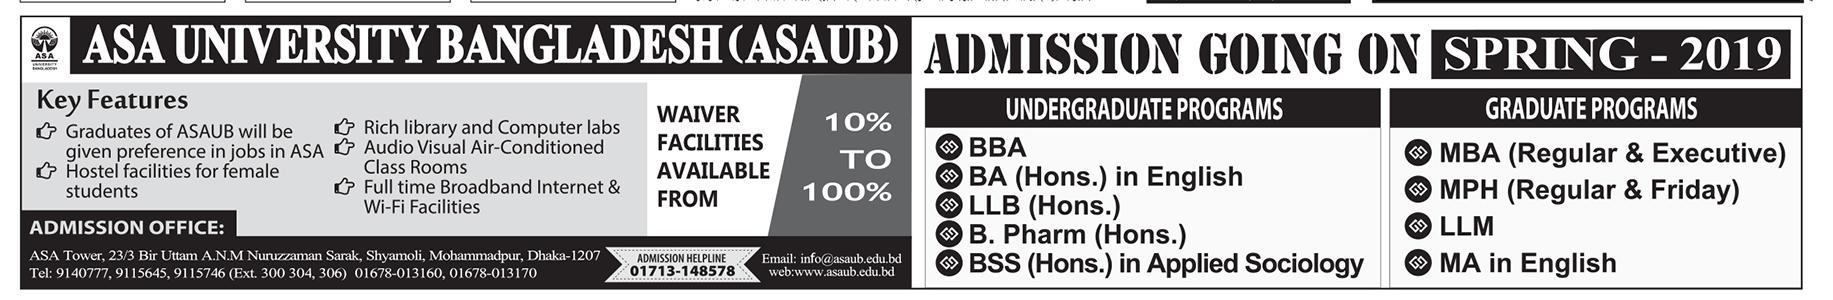 asa-university-admission-spring-2019